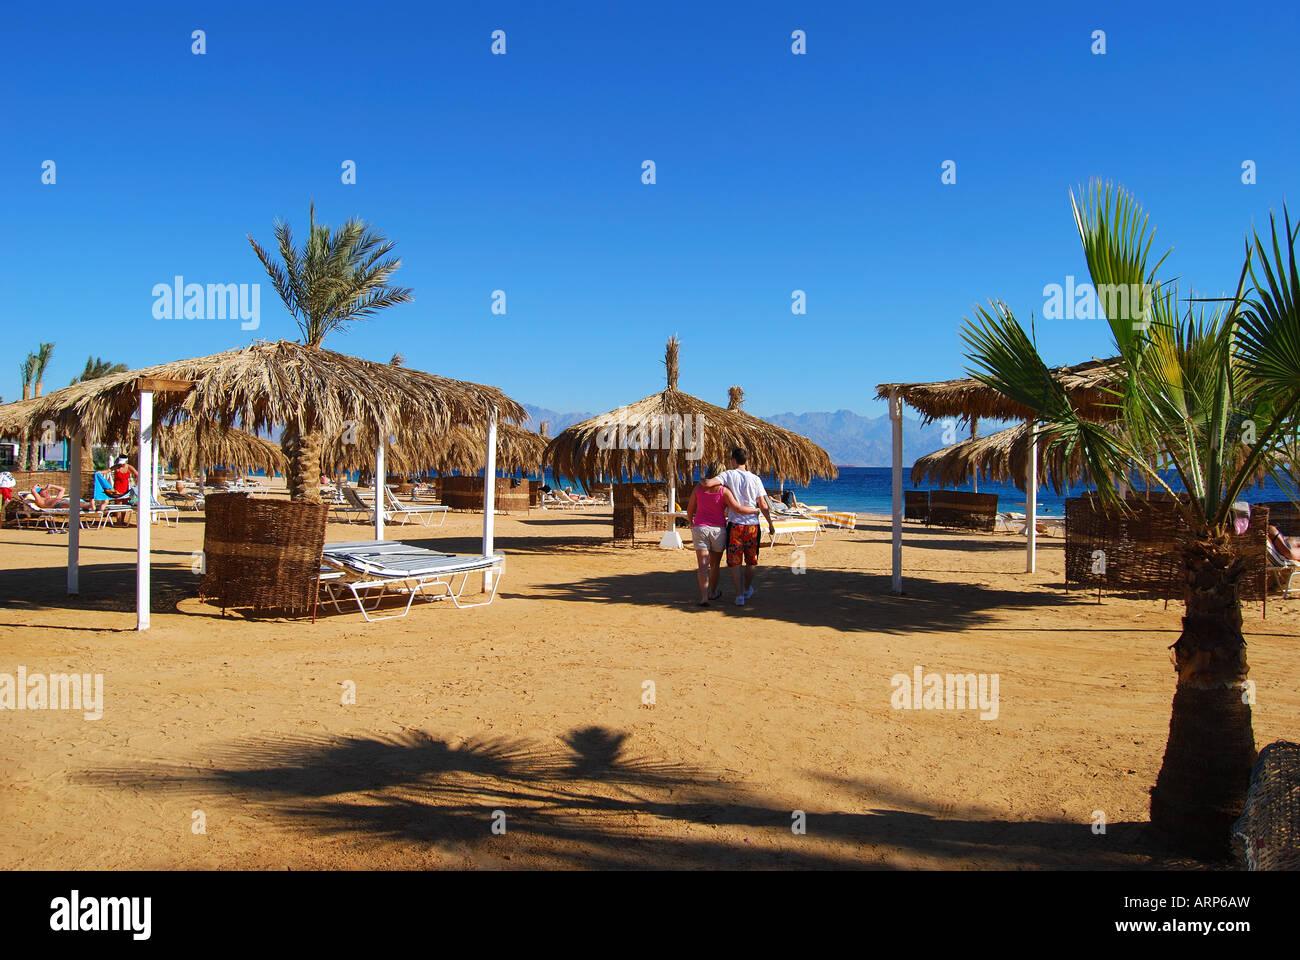 Hilton Nuweiba Coral Resort beach, Nuweiba, Sinai Peninsula, Republic of Egypt - Stock Image